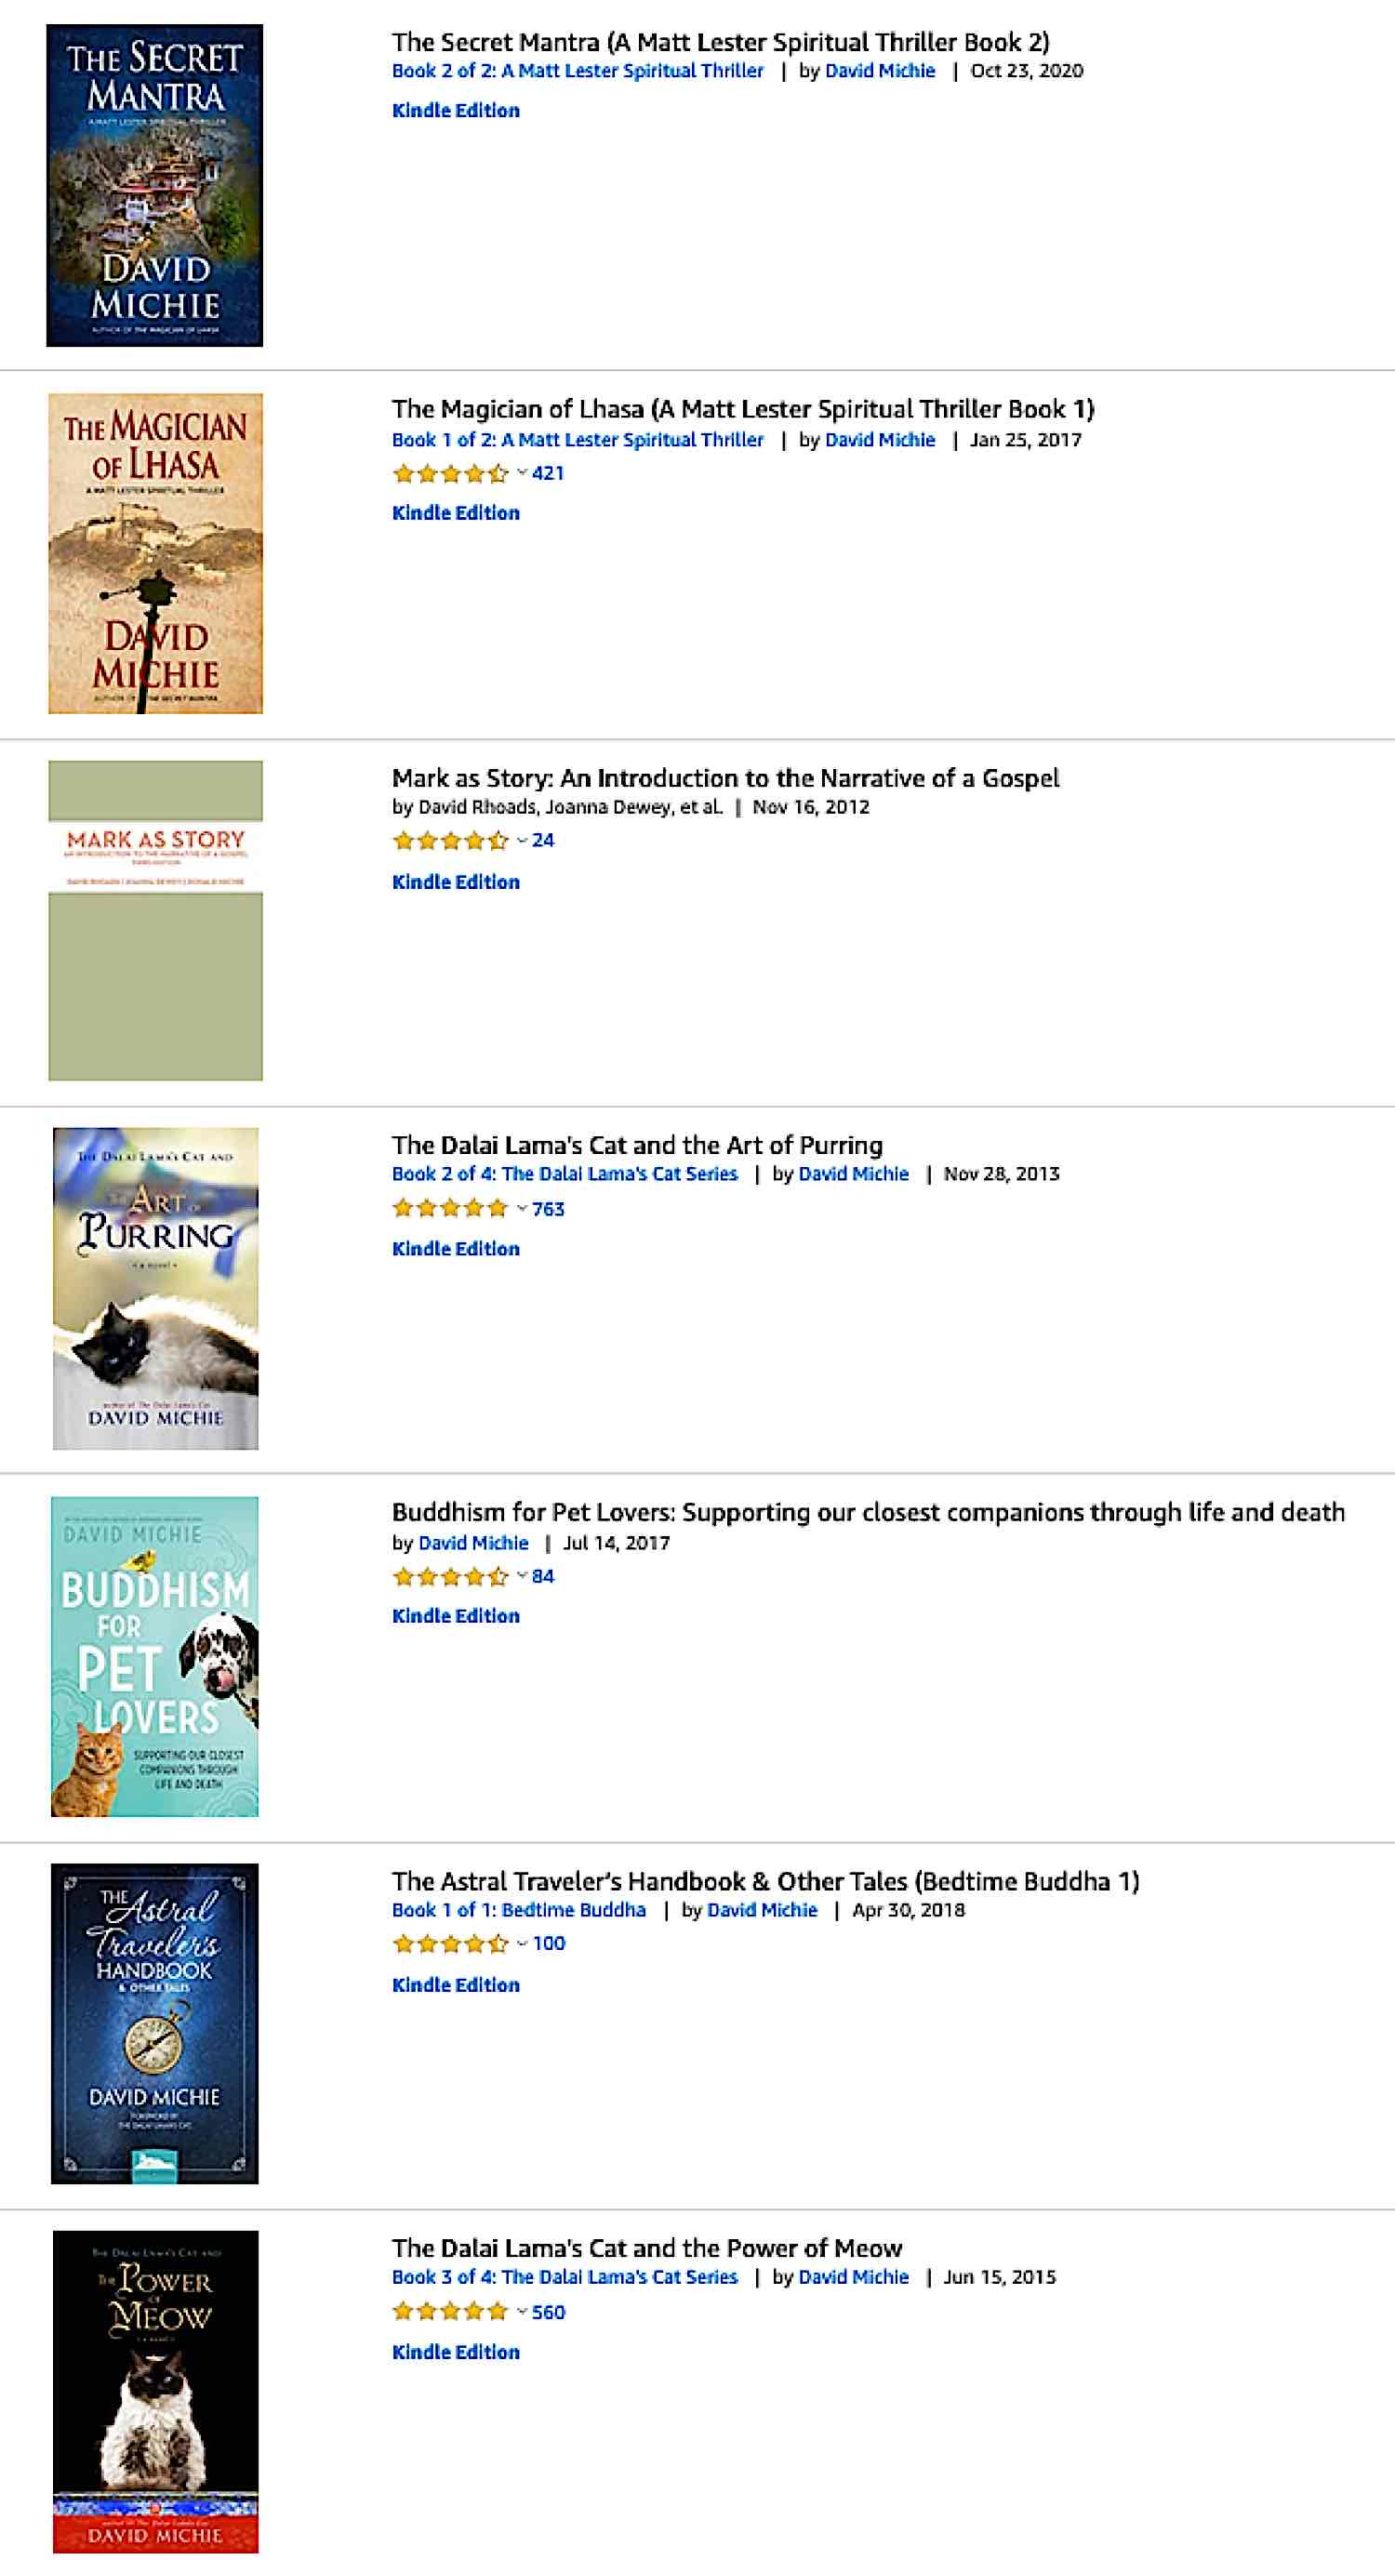 Buddha Weekly David Michie many books Buddhism scaled